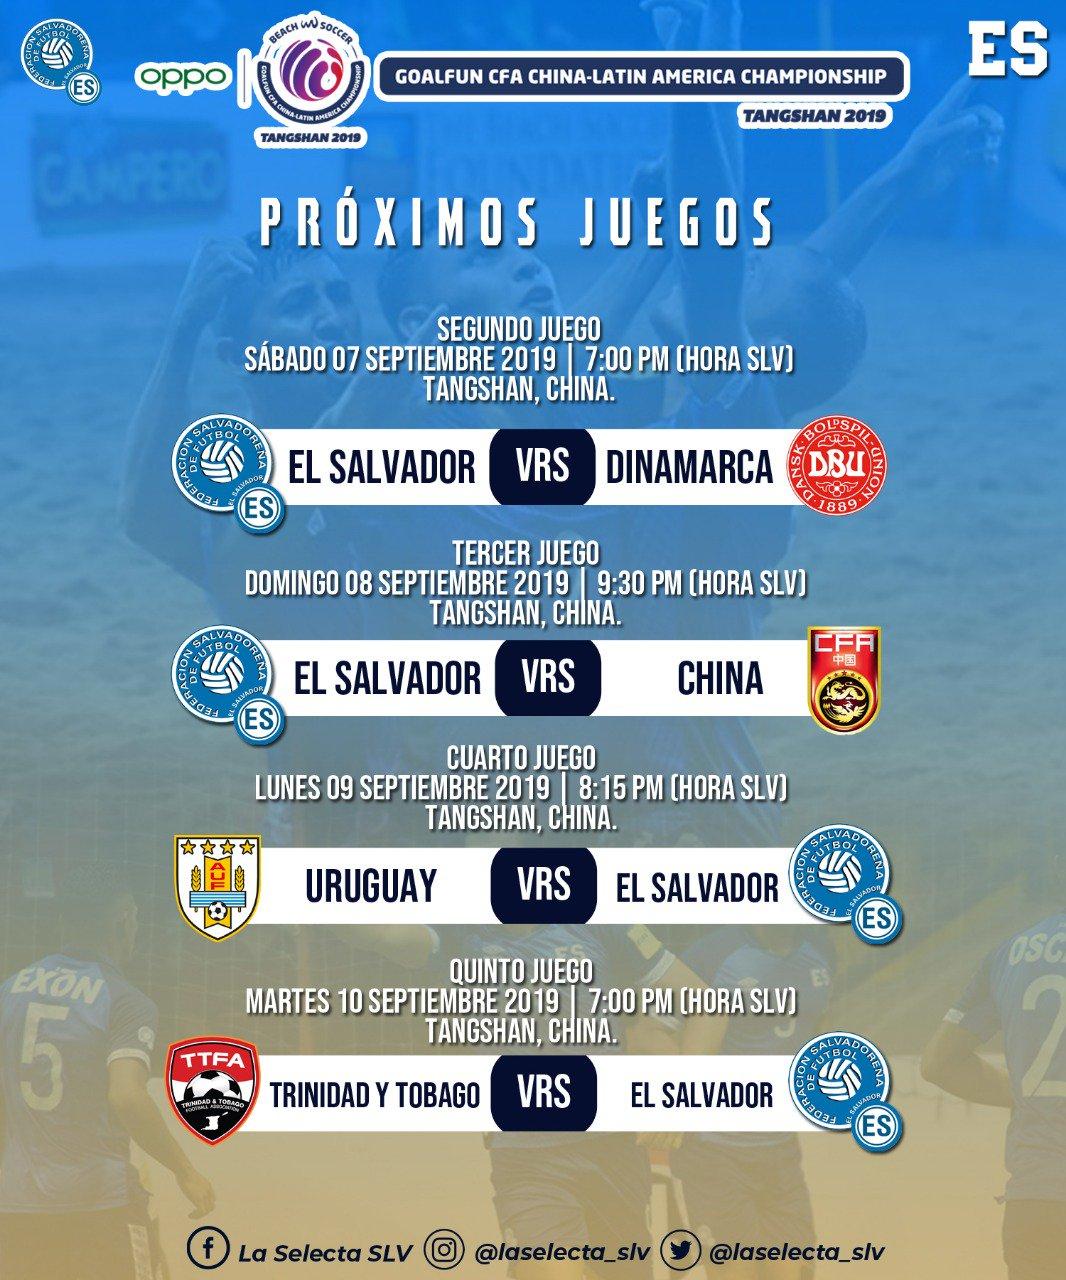 2019 Goalfun CFA China - Latino America Futbol Playa campeonato. ED1pqCfWwAAvDdP?format=jpg&name=large